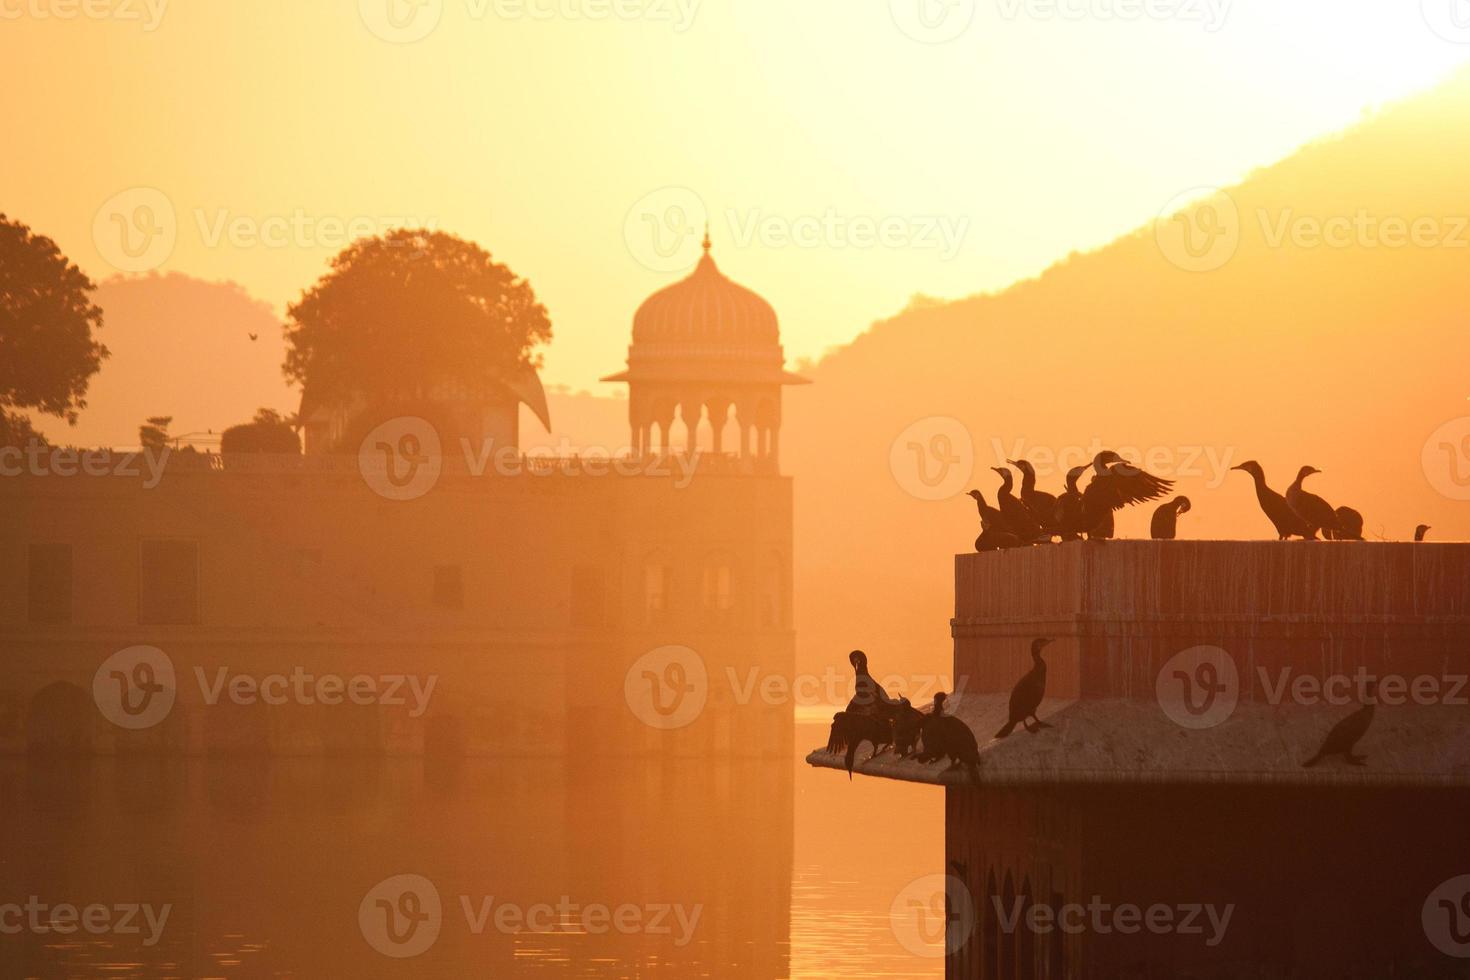 Sonnenaufgang im Jalmahal-Palast, Jaipur foto